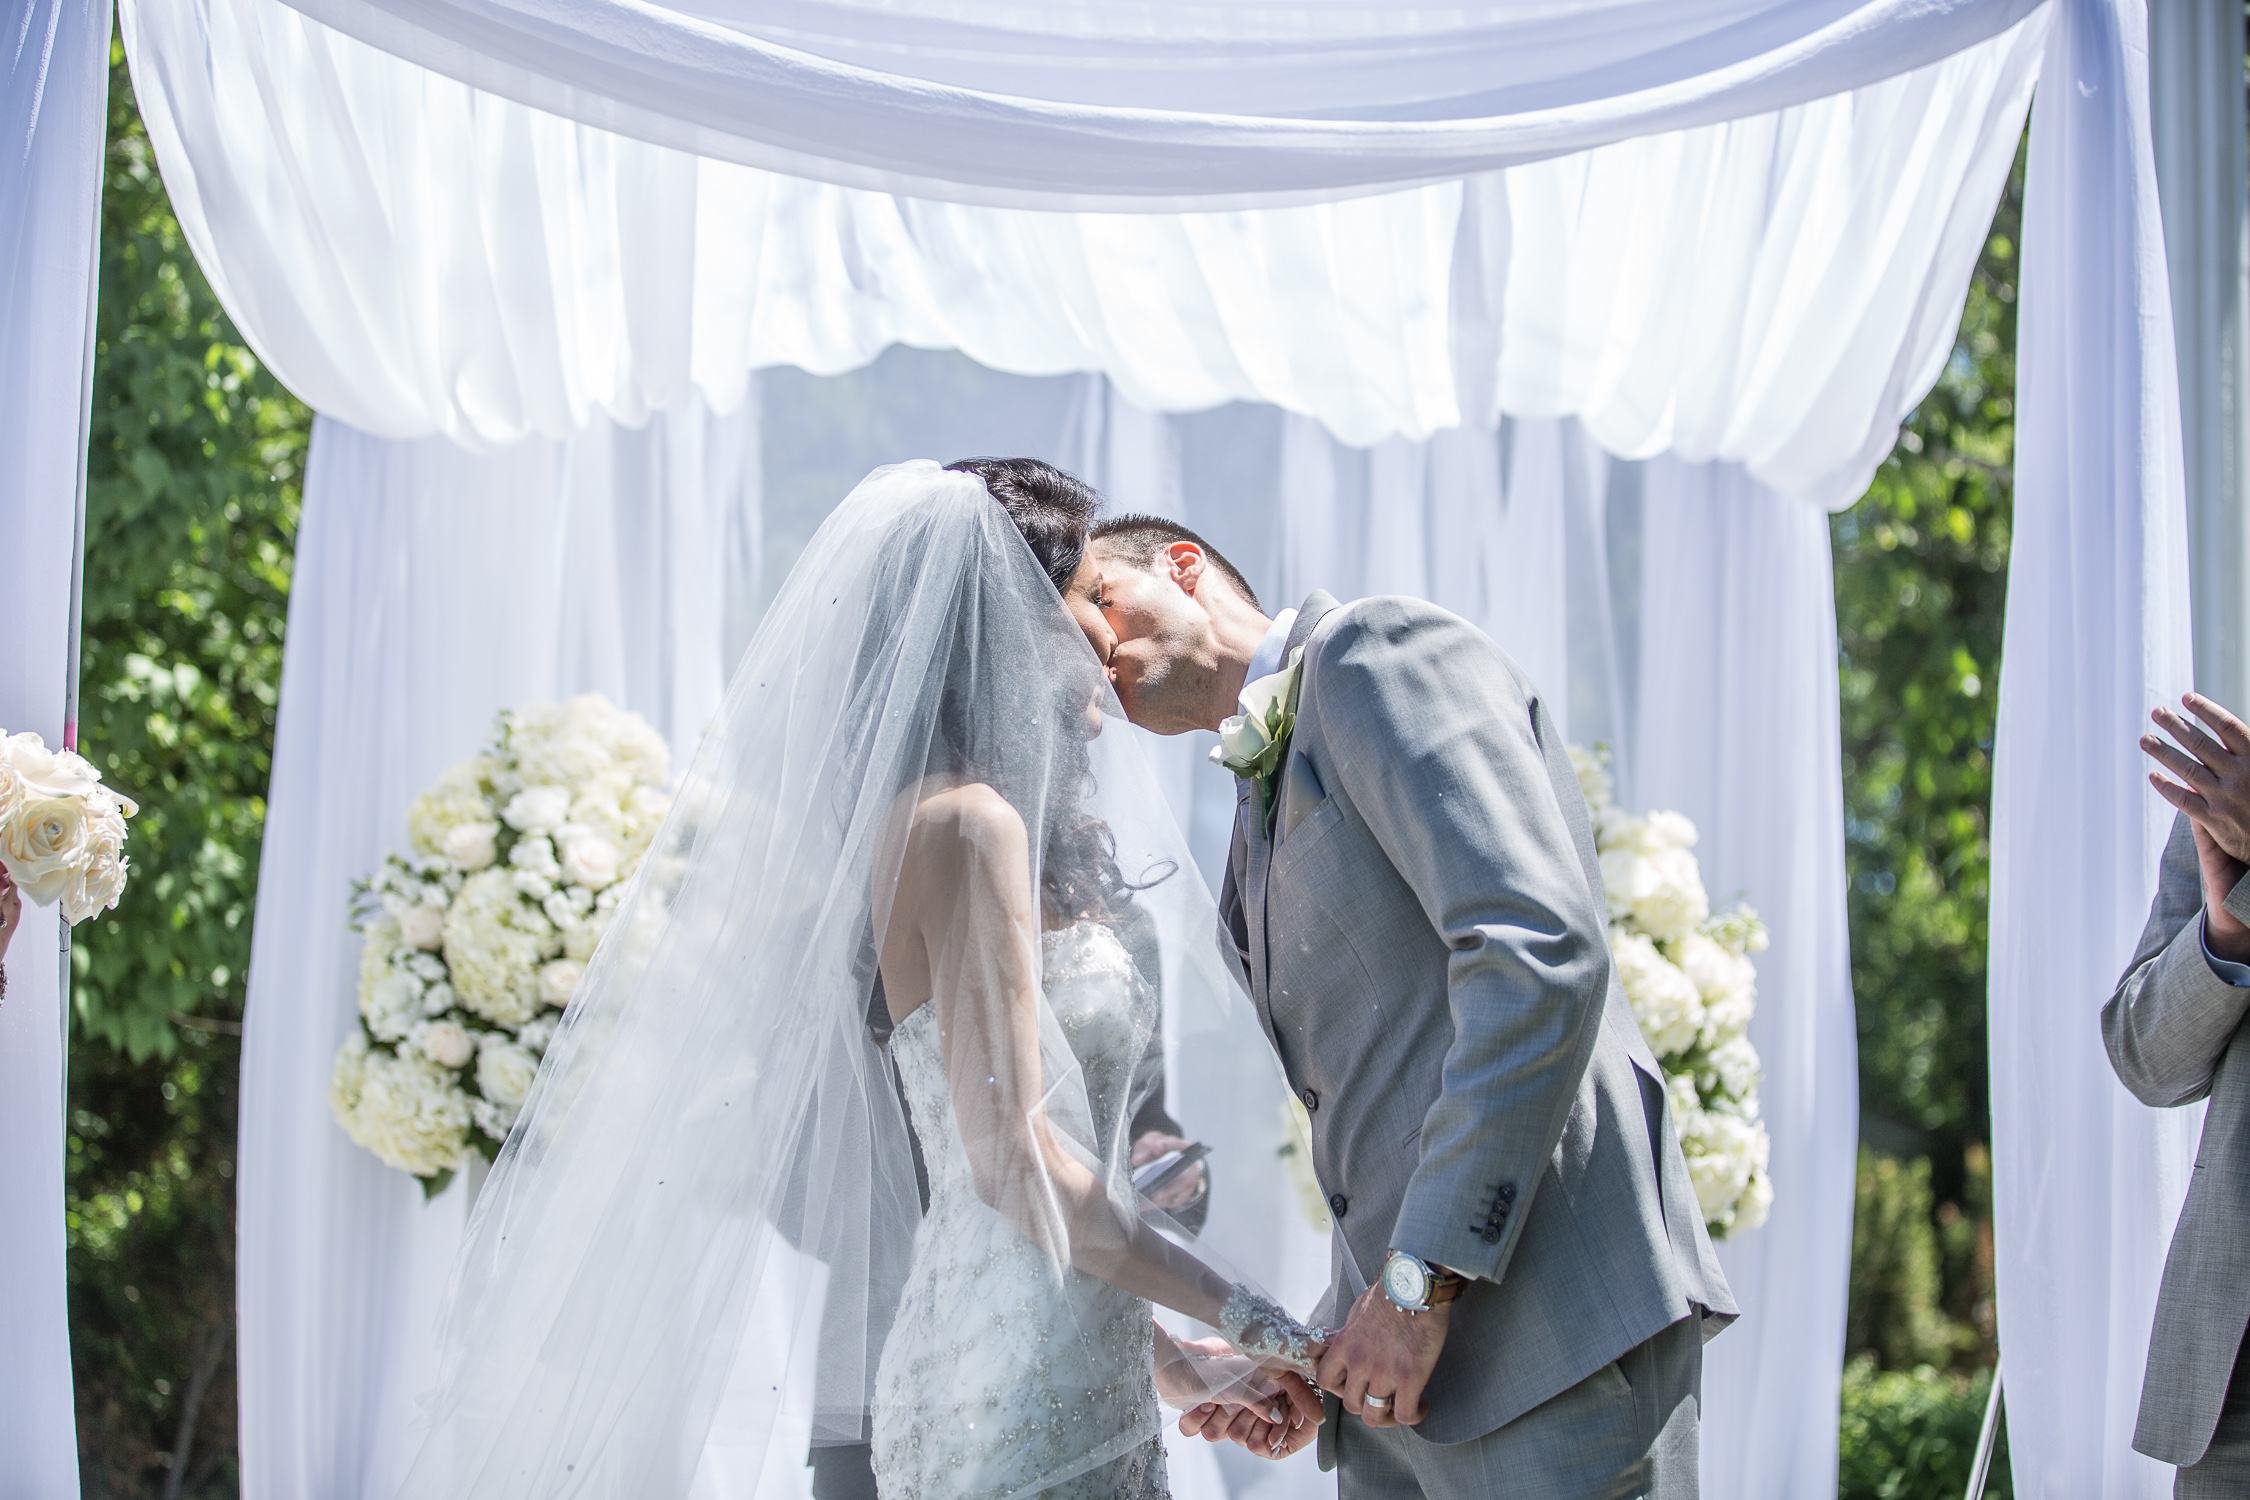 Paradise-Banquet-Hall-Wedding-Vaughan-Ontario-0047.jpg